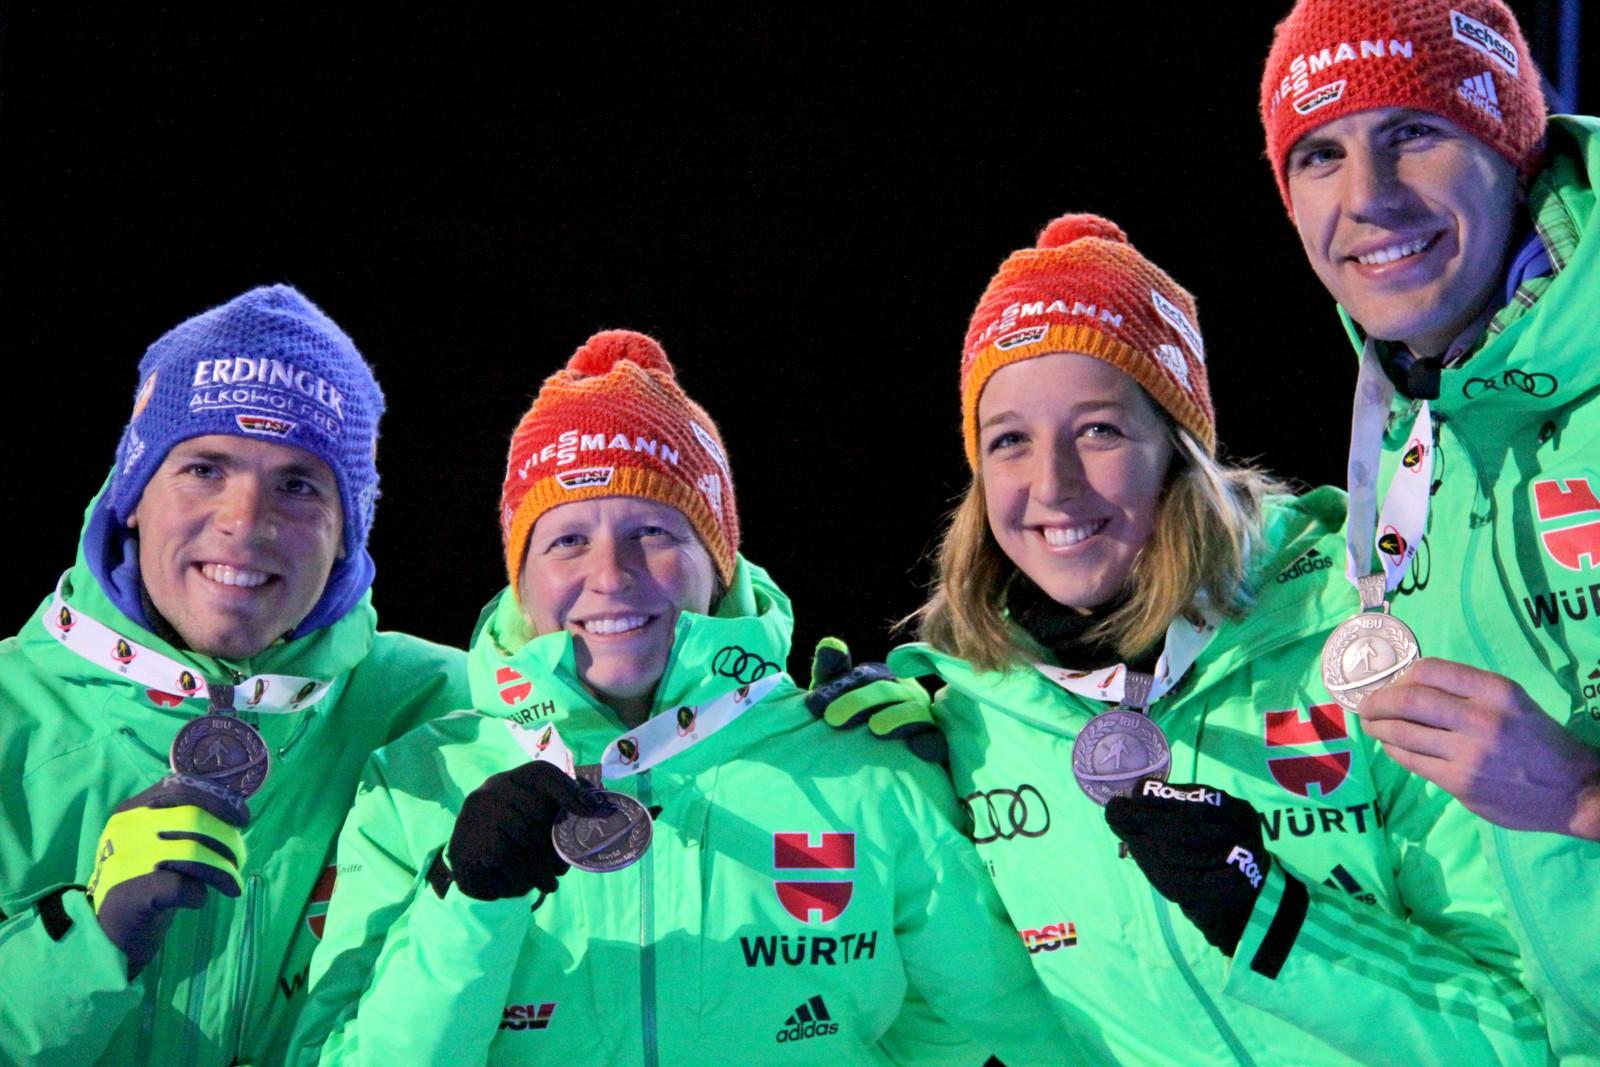 German silver medal winners, from left: Simon Schempp, Franziska Hildebrand, Franziska Preuss and Arnd Peiffer.